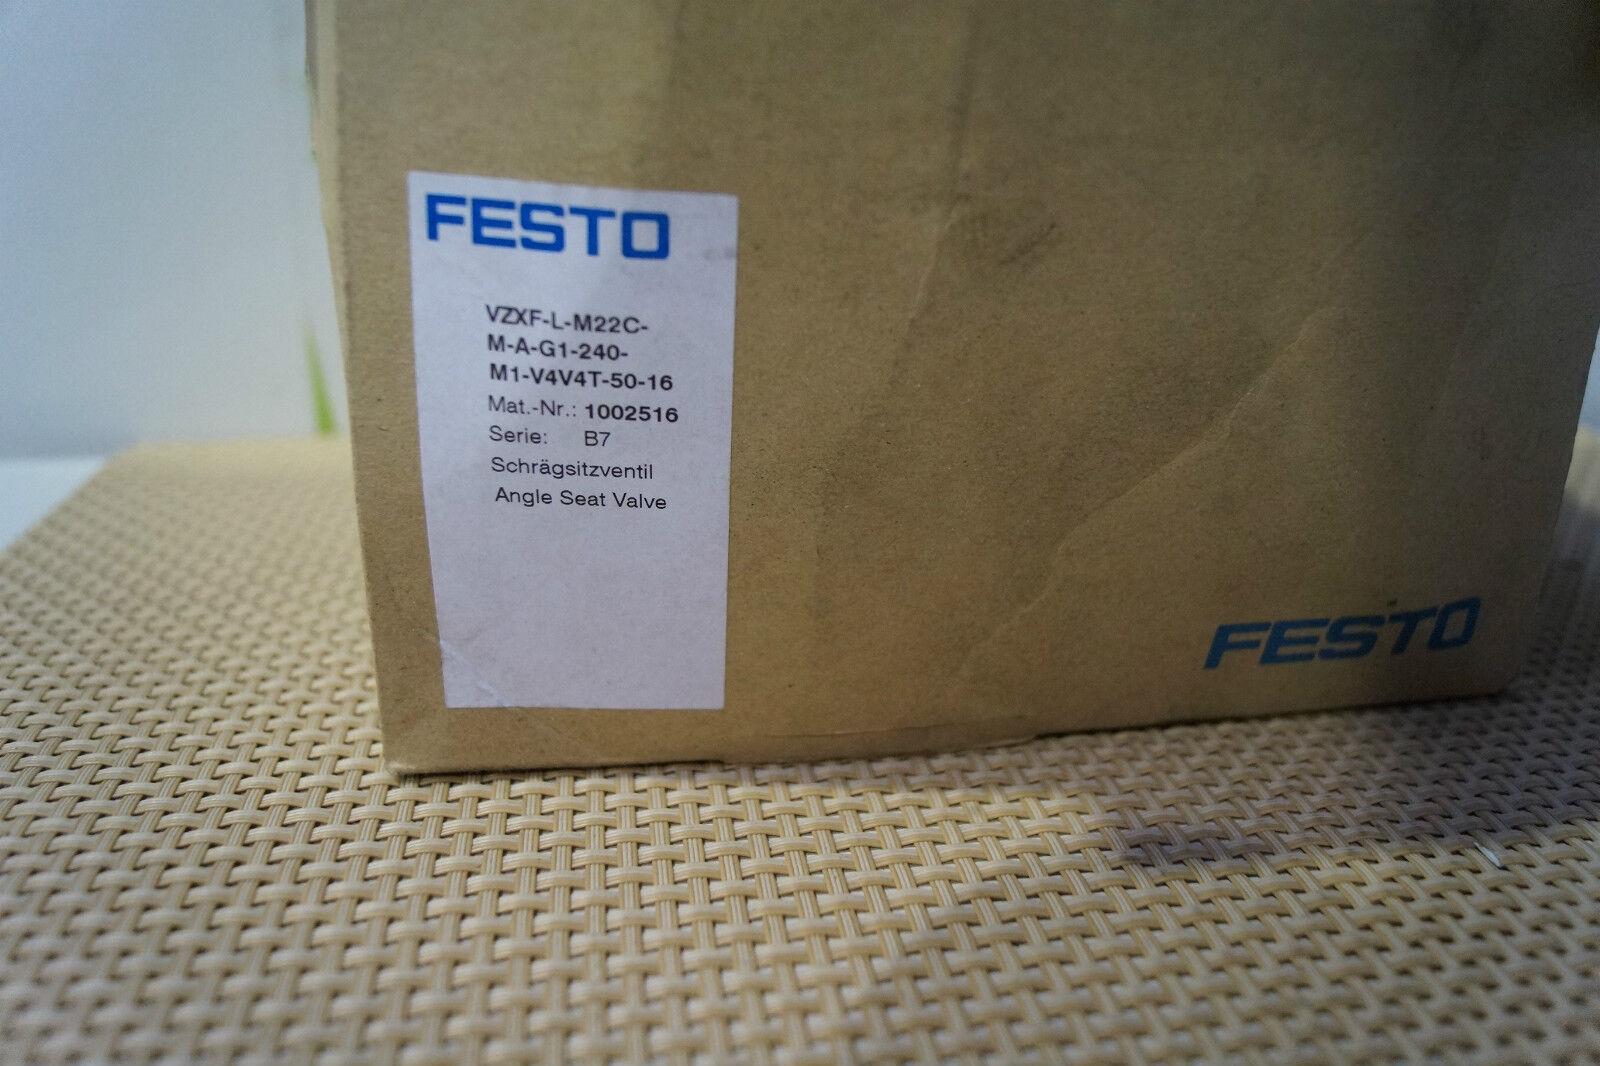 FESTO VZXF-L-M22C-M-A-G1-240-M1-V4V4T-50-16, Schrägsitzventil (NEU/OVP), 1002516